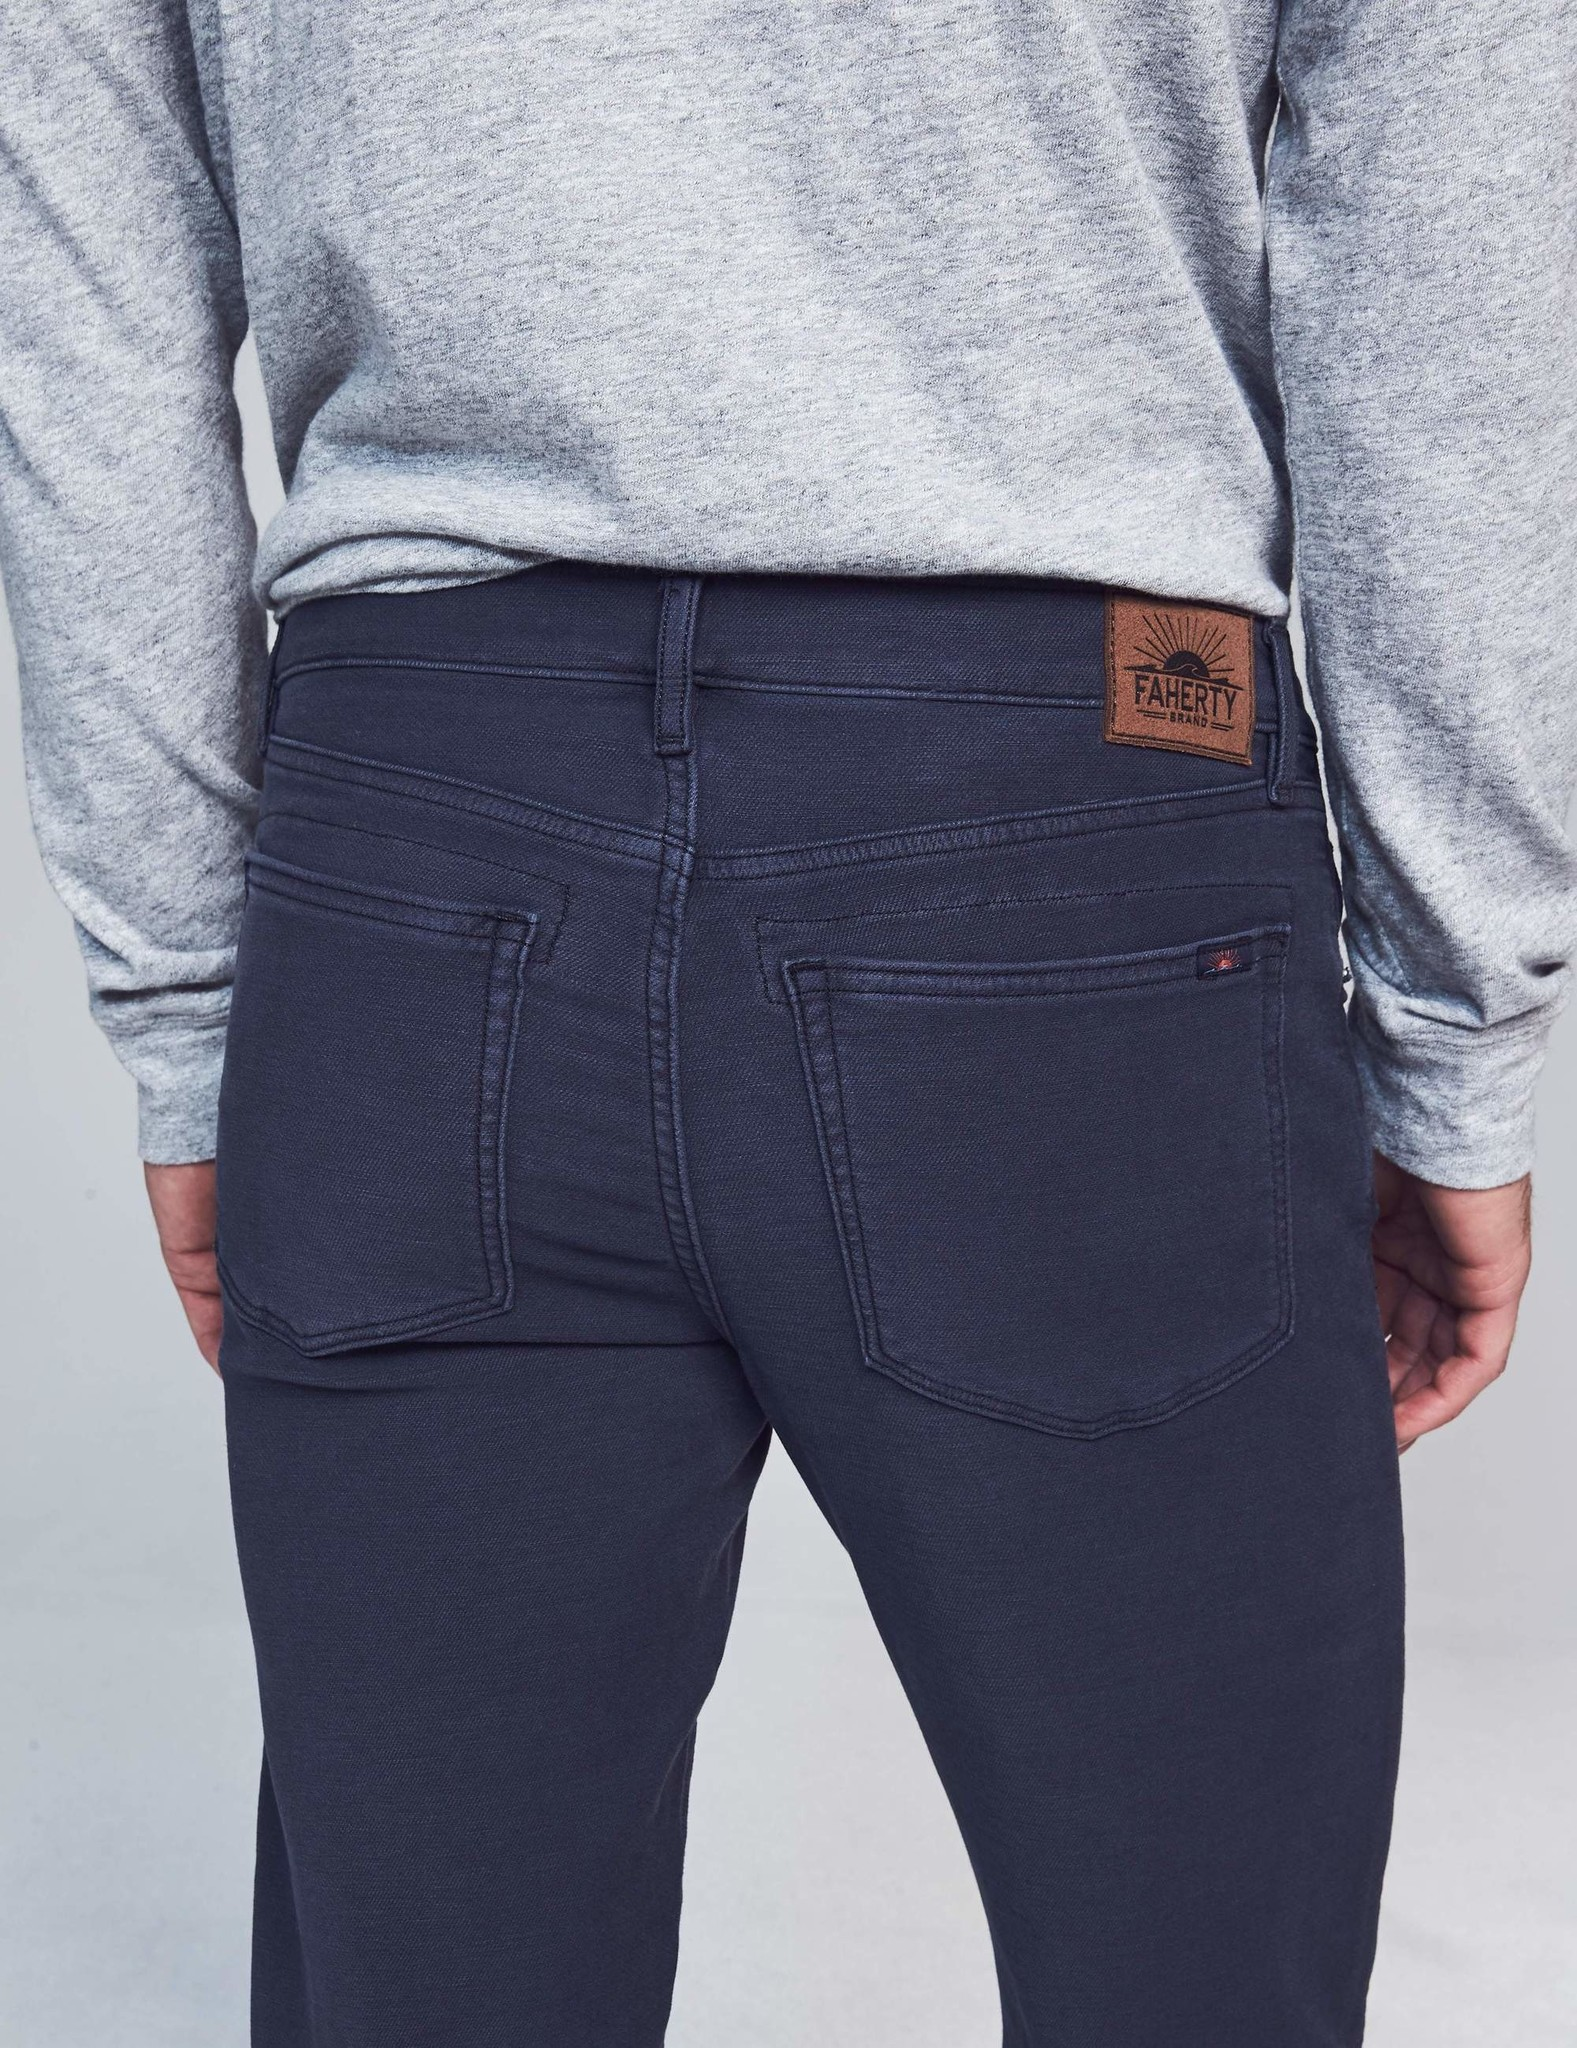 Faherty Faherty Stretch Terry 5 Pocket Pant